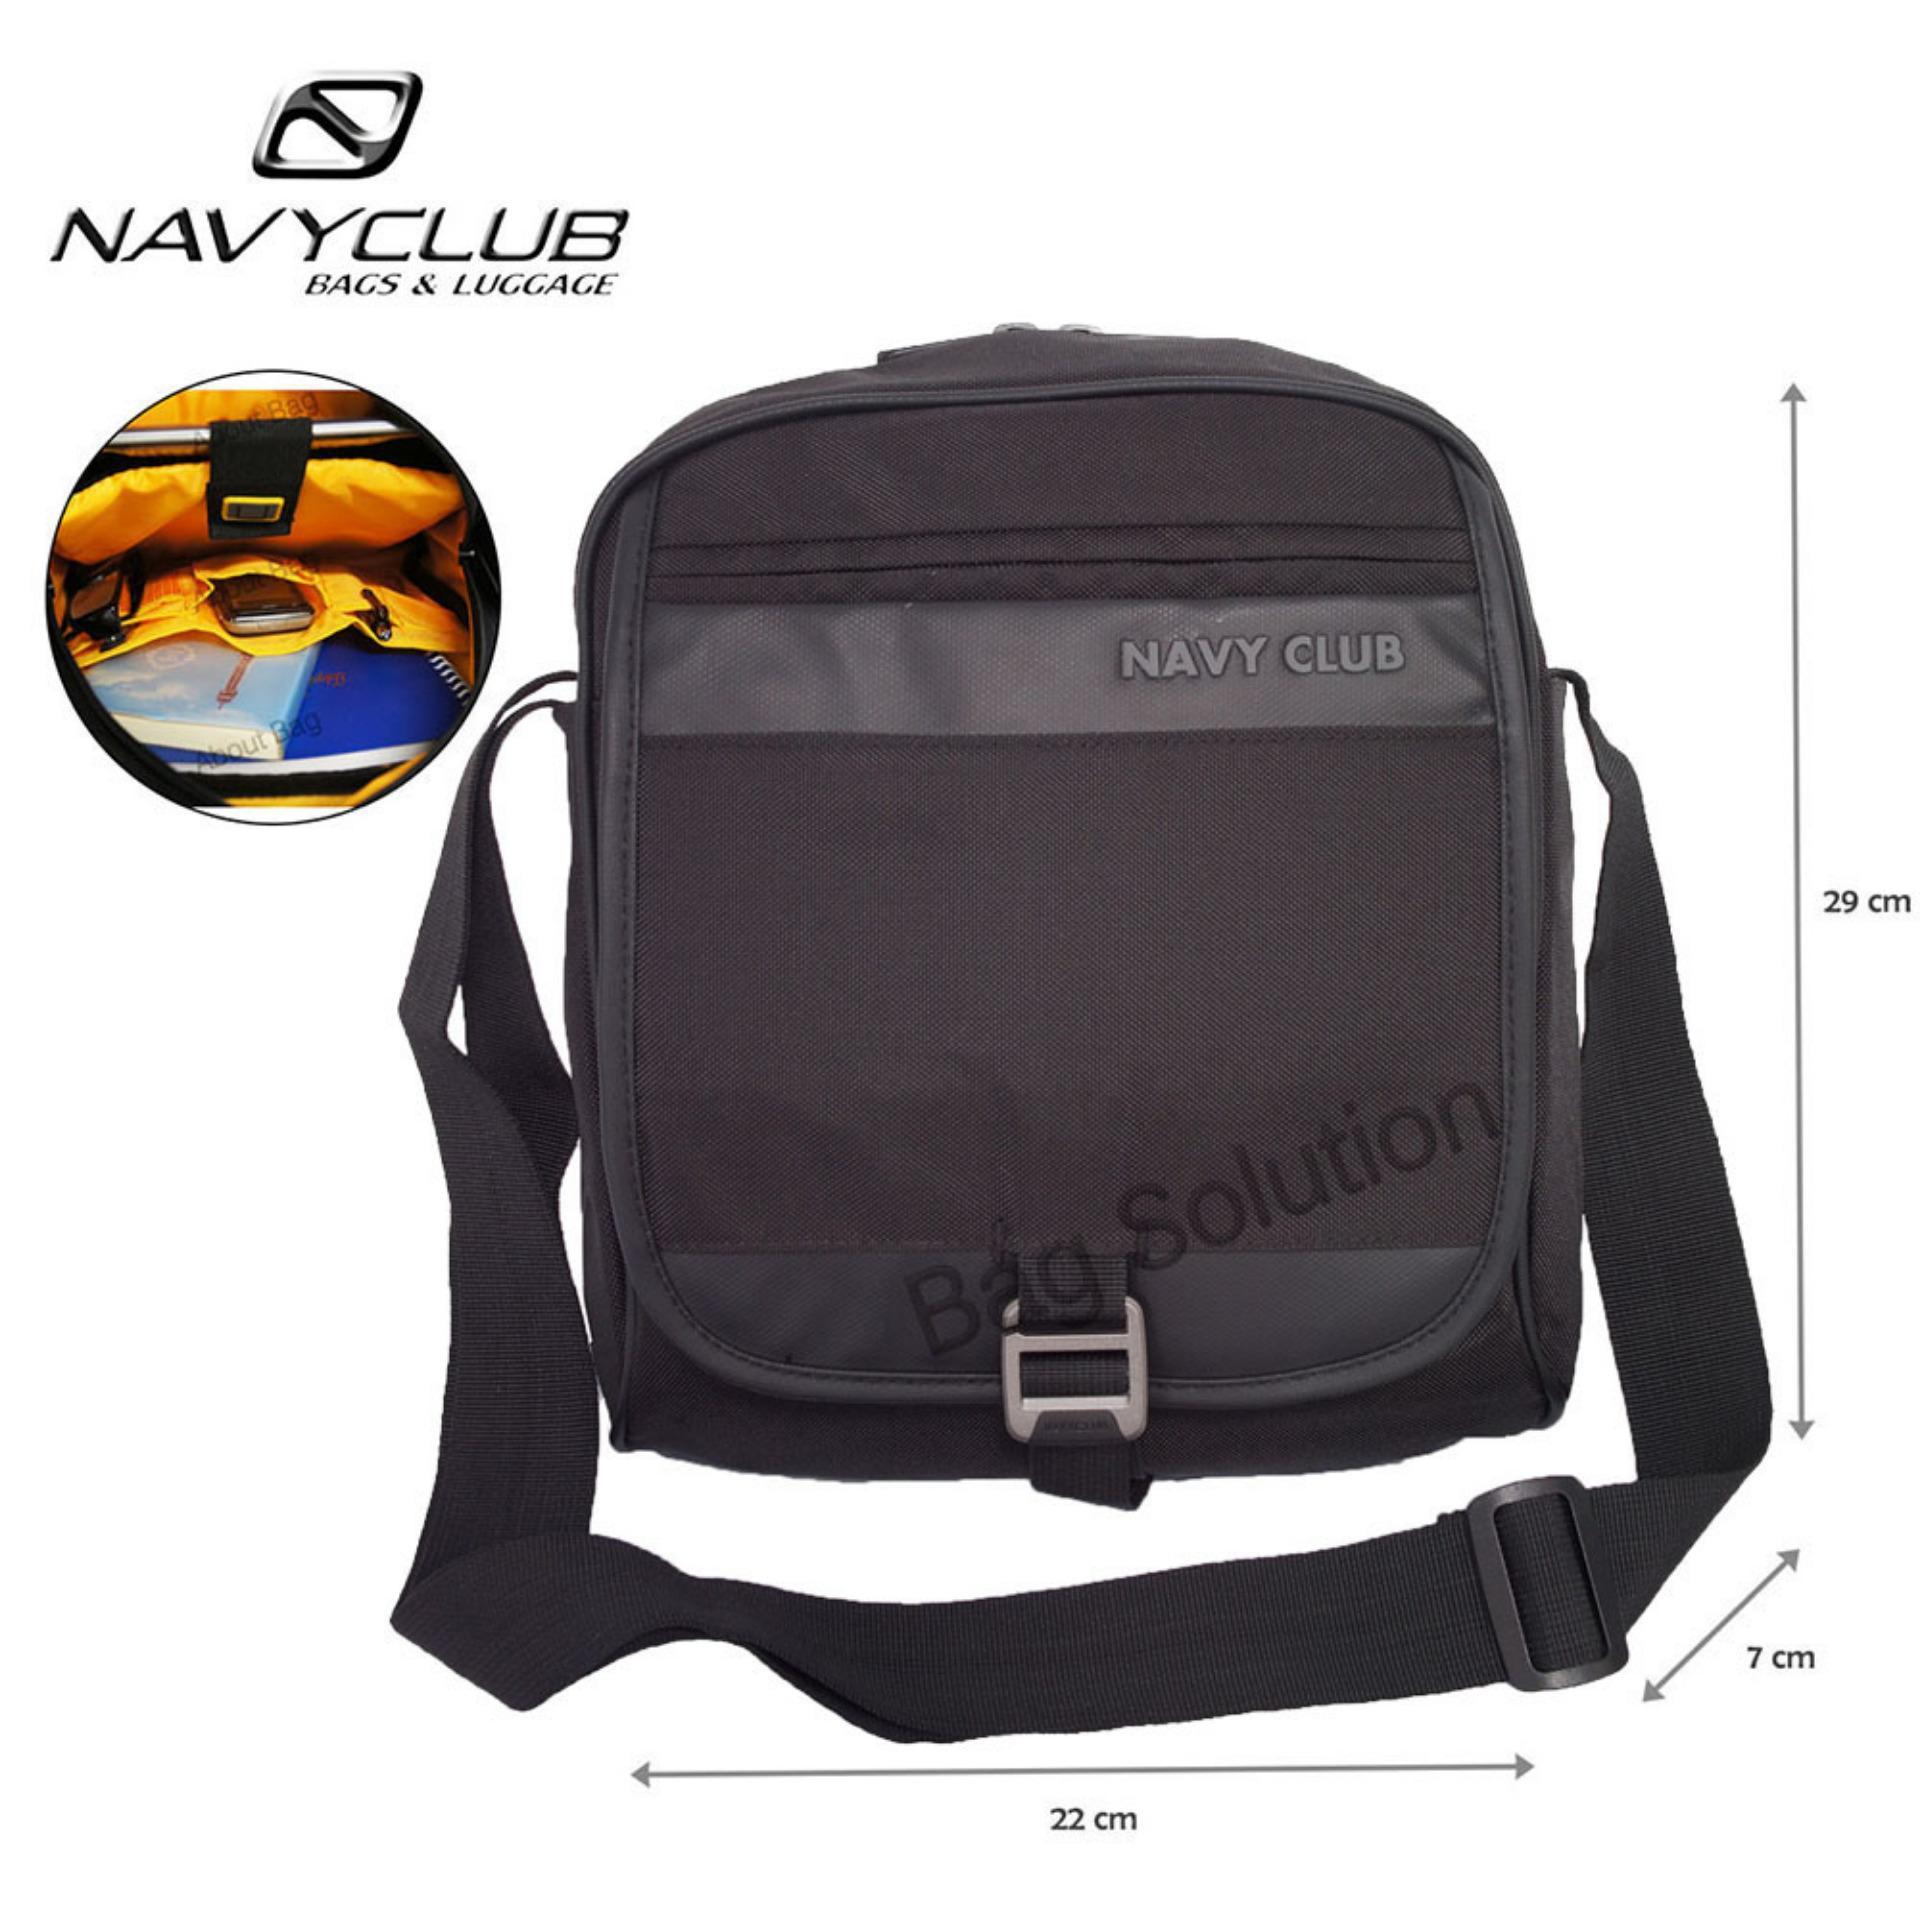 Navy Club Tas Selempang Tablet Ipad Up to 10 Inch - Tas Pria Tas Wanita 8271 - Hitam